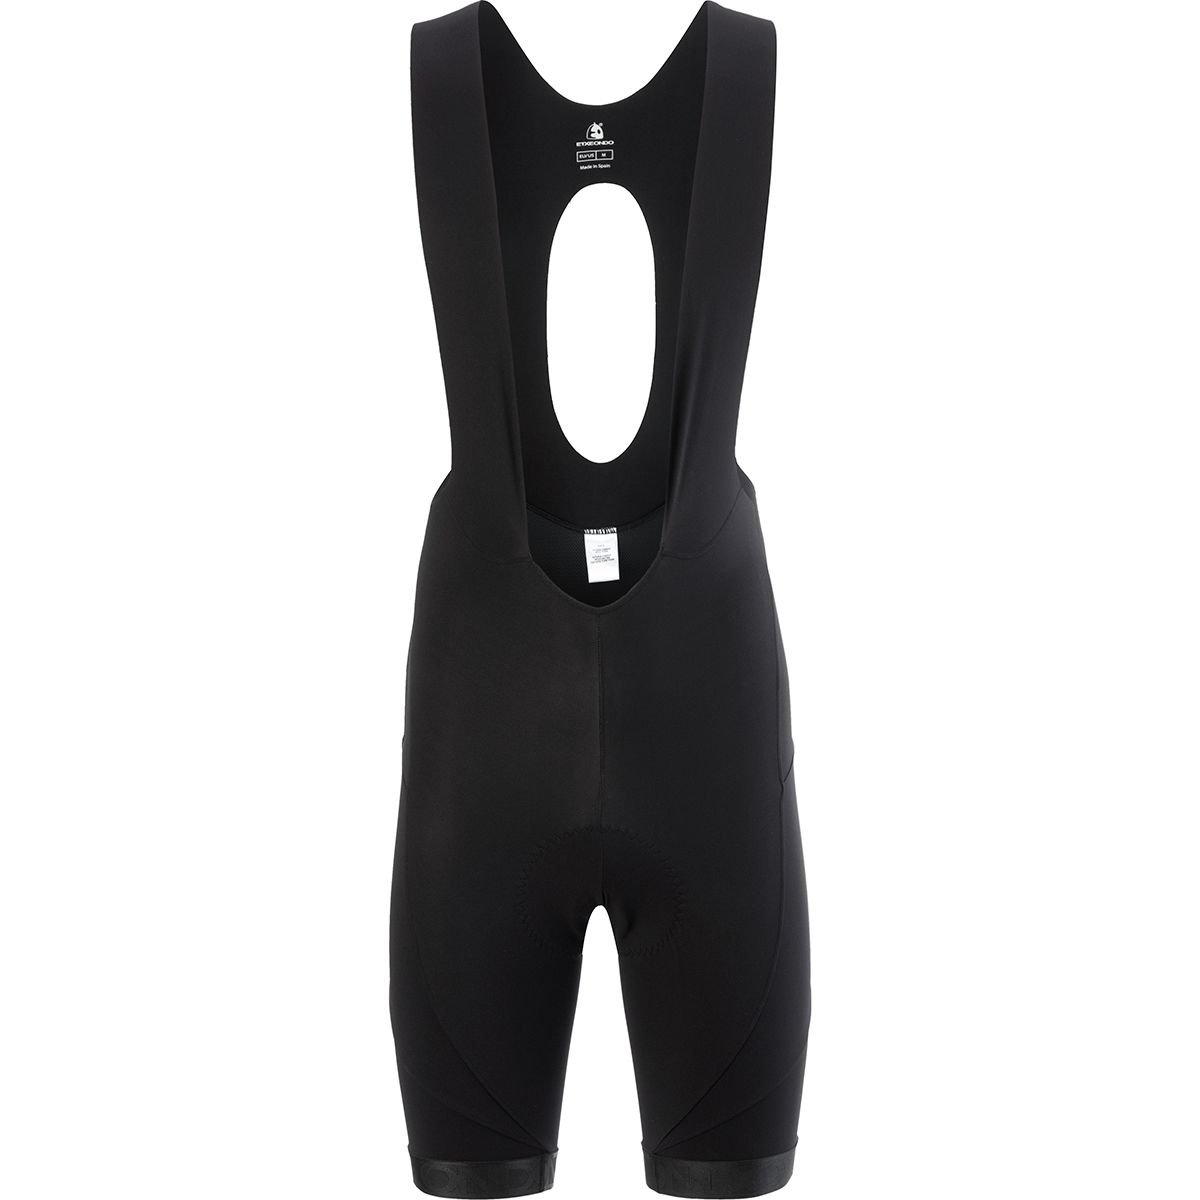 ETXEONDO Cuissard Orhi Bib-Short Men schwarz Größe XL 2018 Bib Shorts